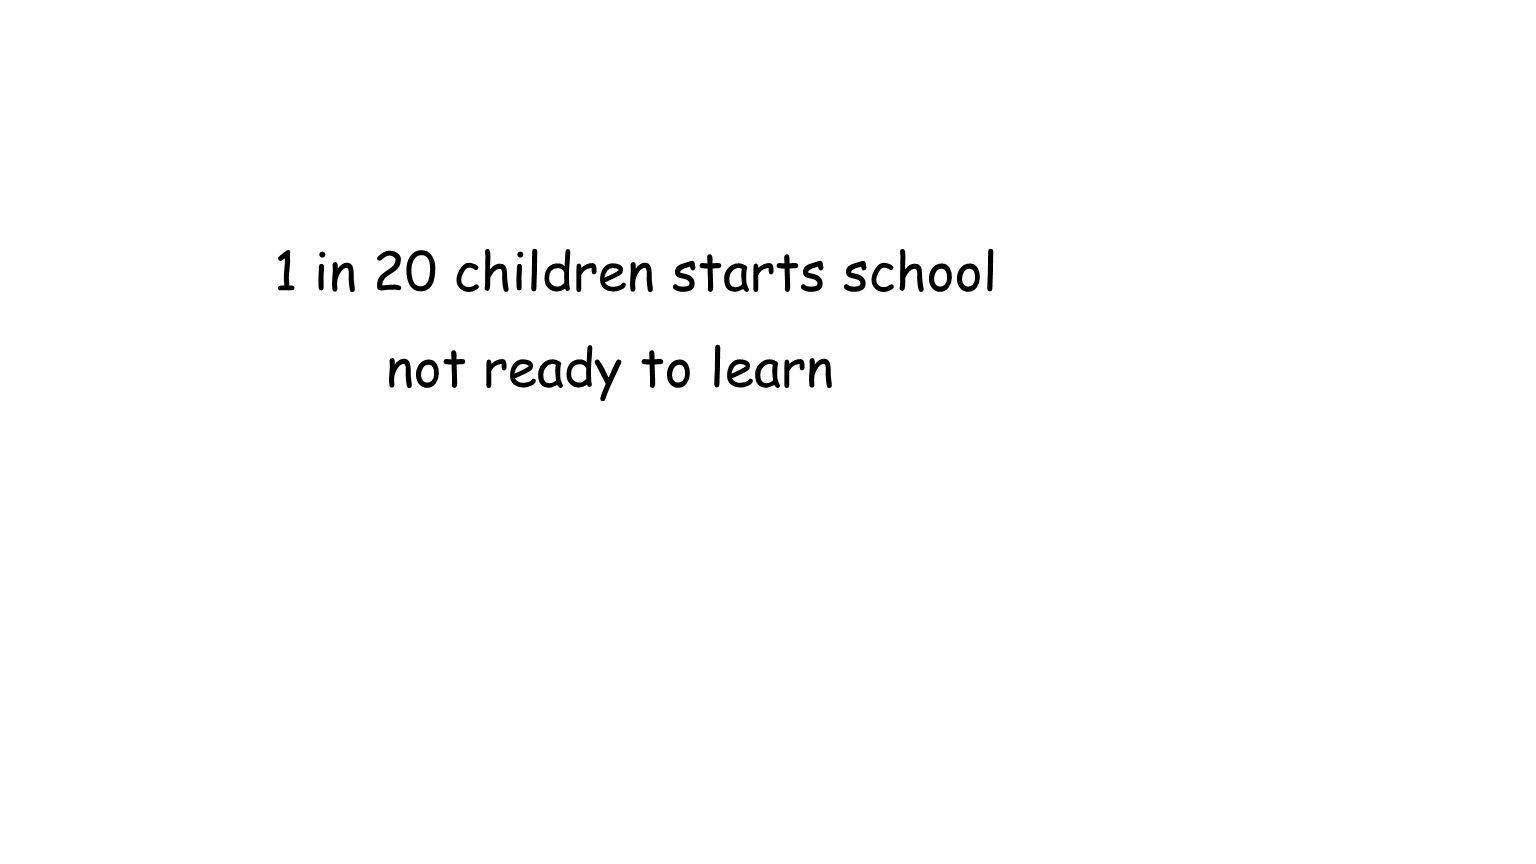 1 in 20 children starts school not ready to learn